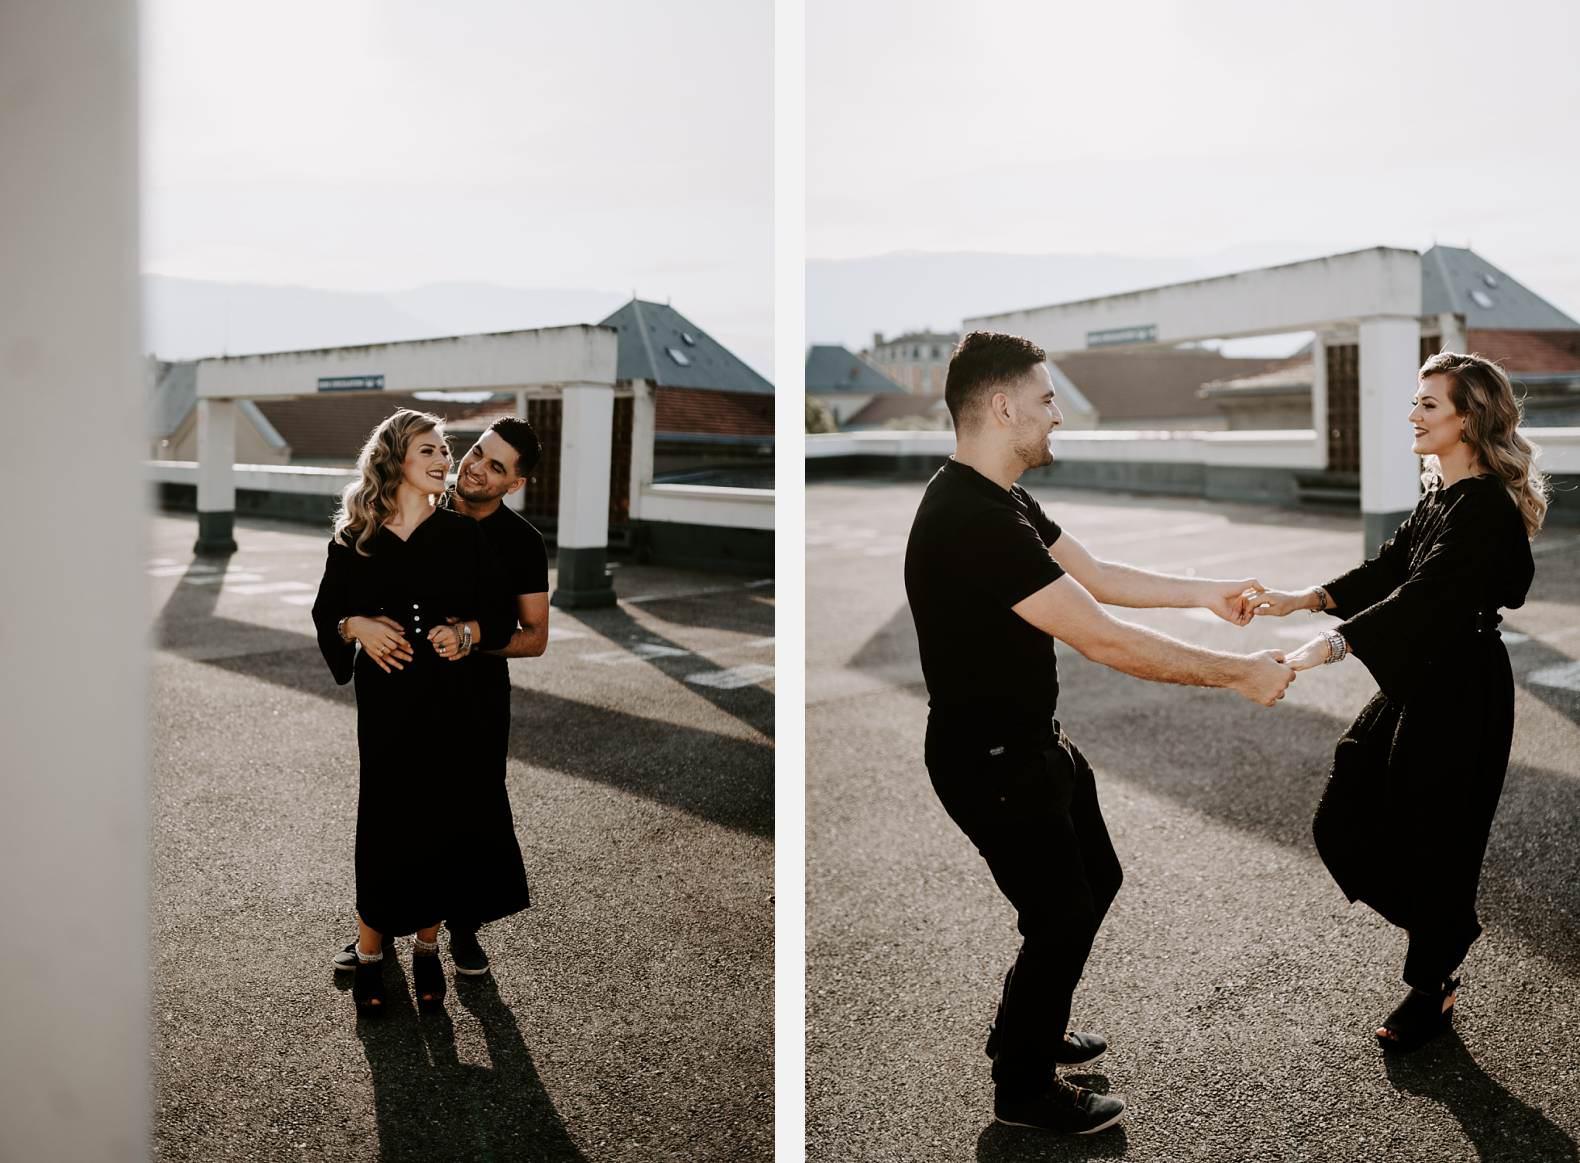 seance couple urbain grenoble chartreuse photographe bel esprit 0005